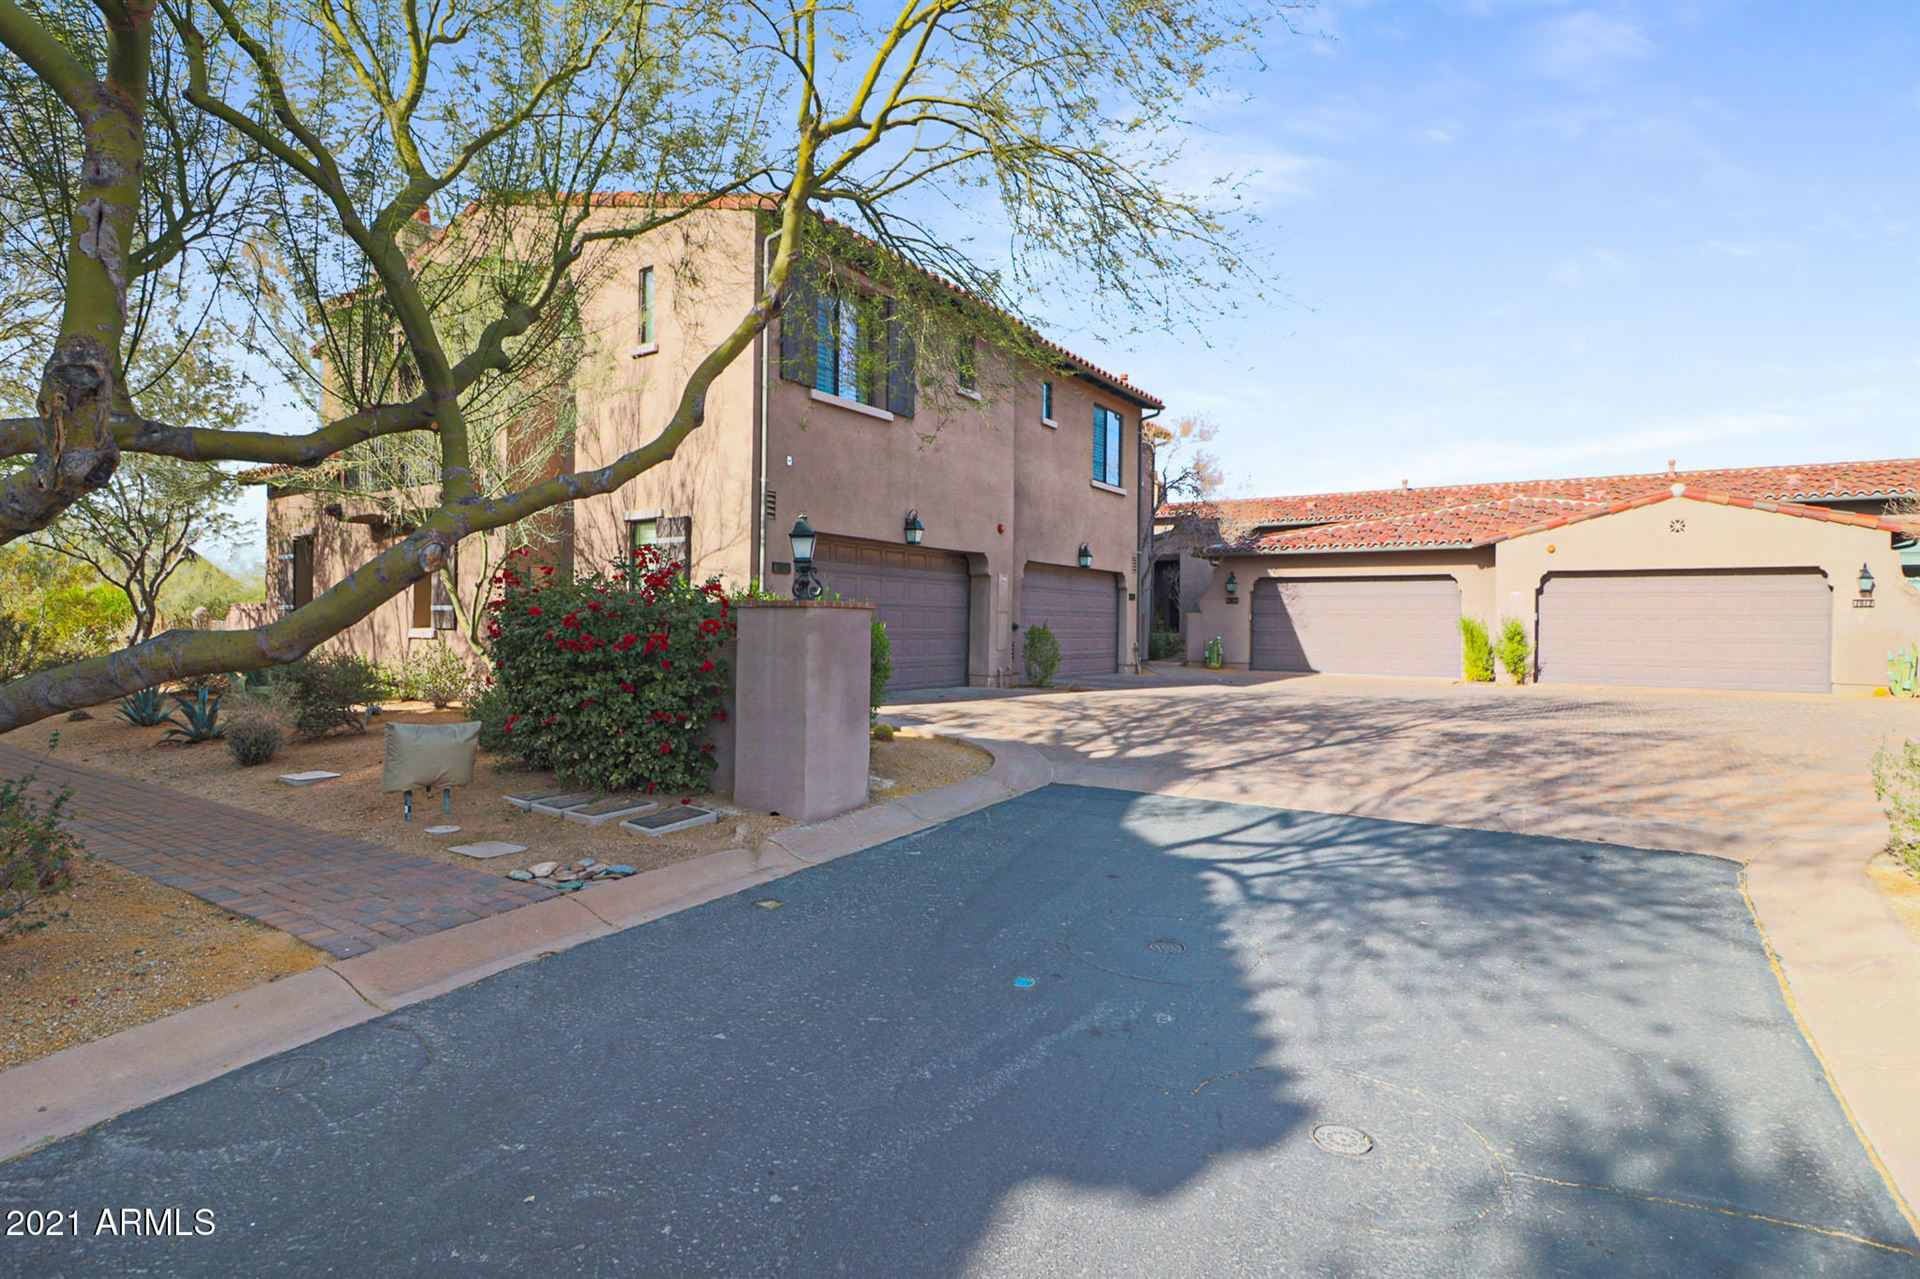 Photo of 20704 N 90th Place #1010, Scottsdale, AZ 85255 (MLS # 6182521)